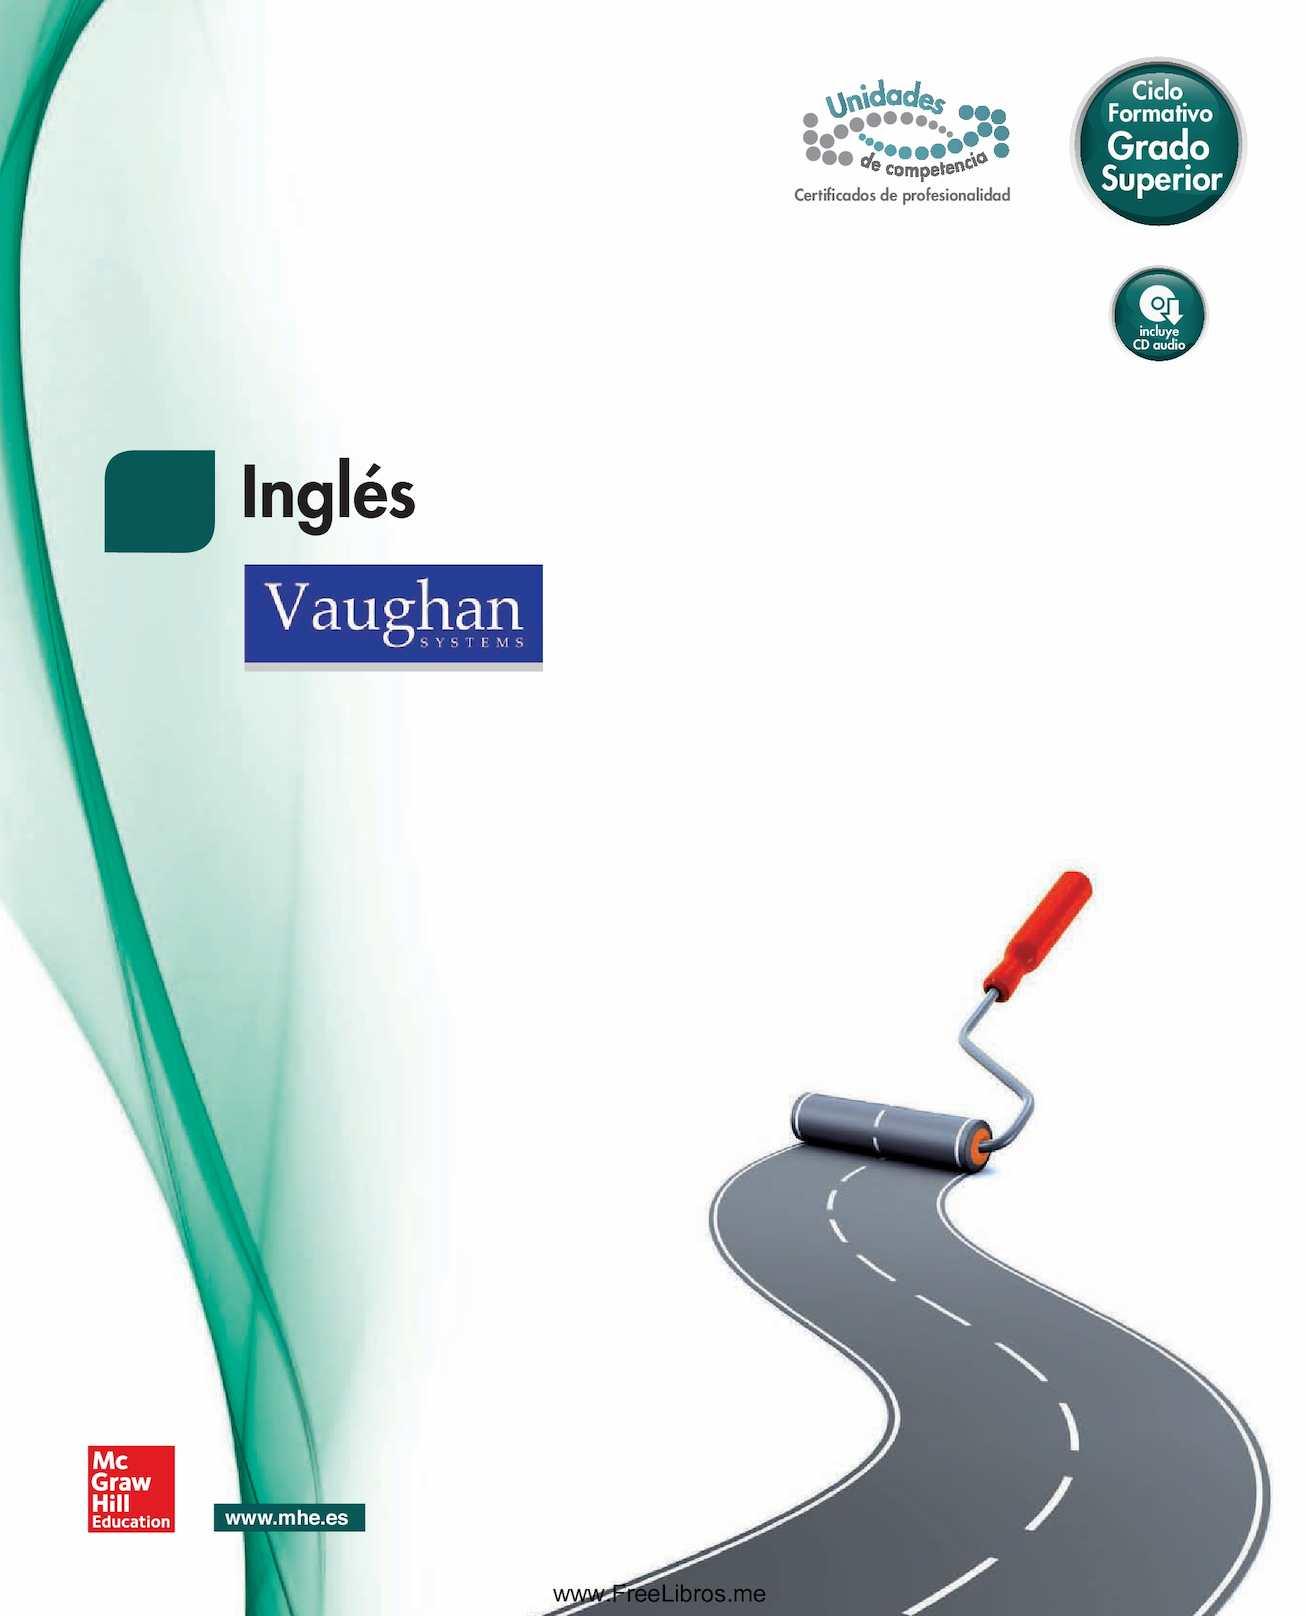 mcgraw hill books for upsc pdf